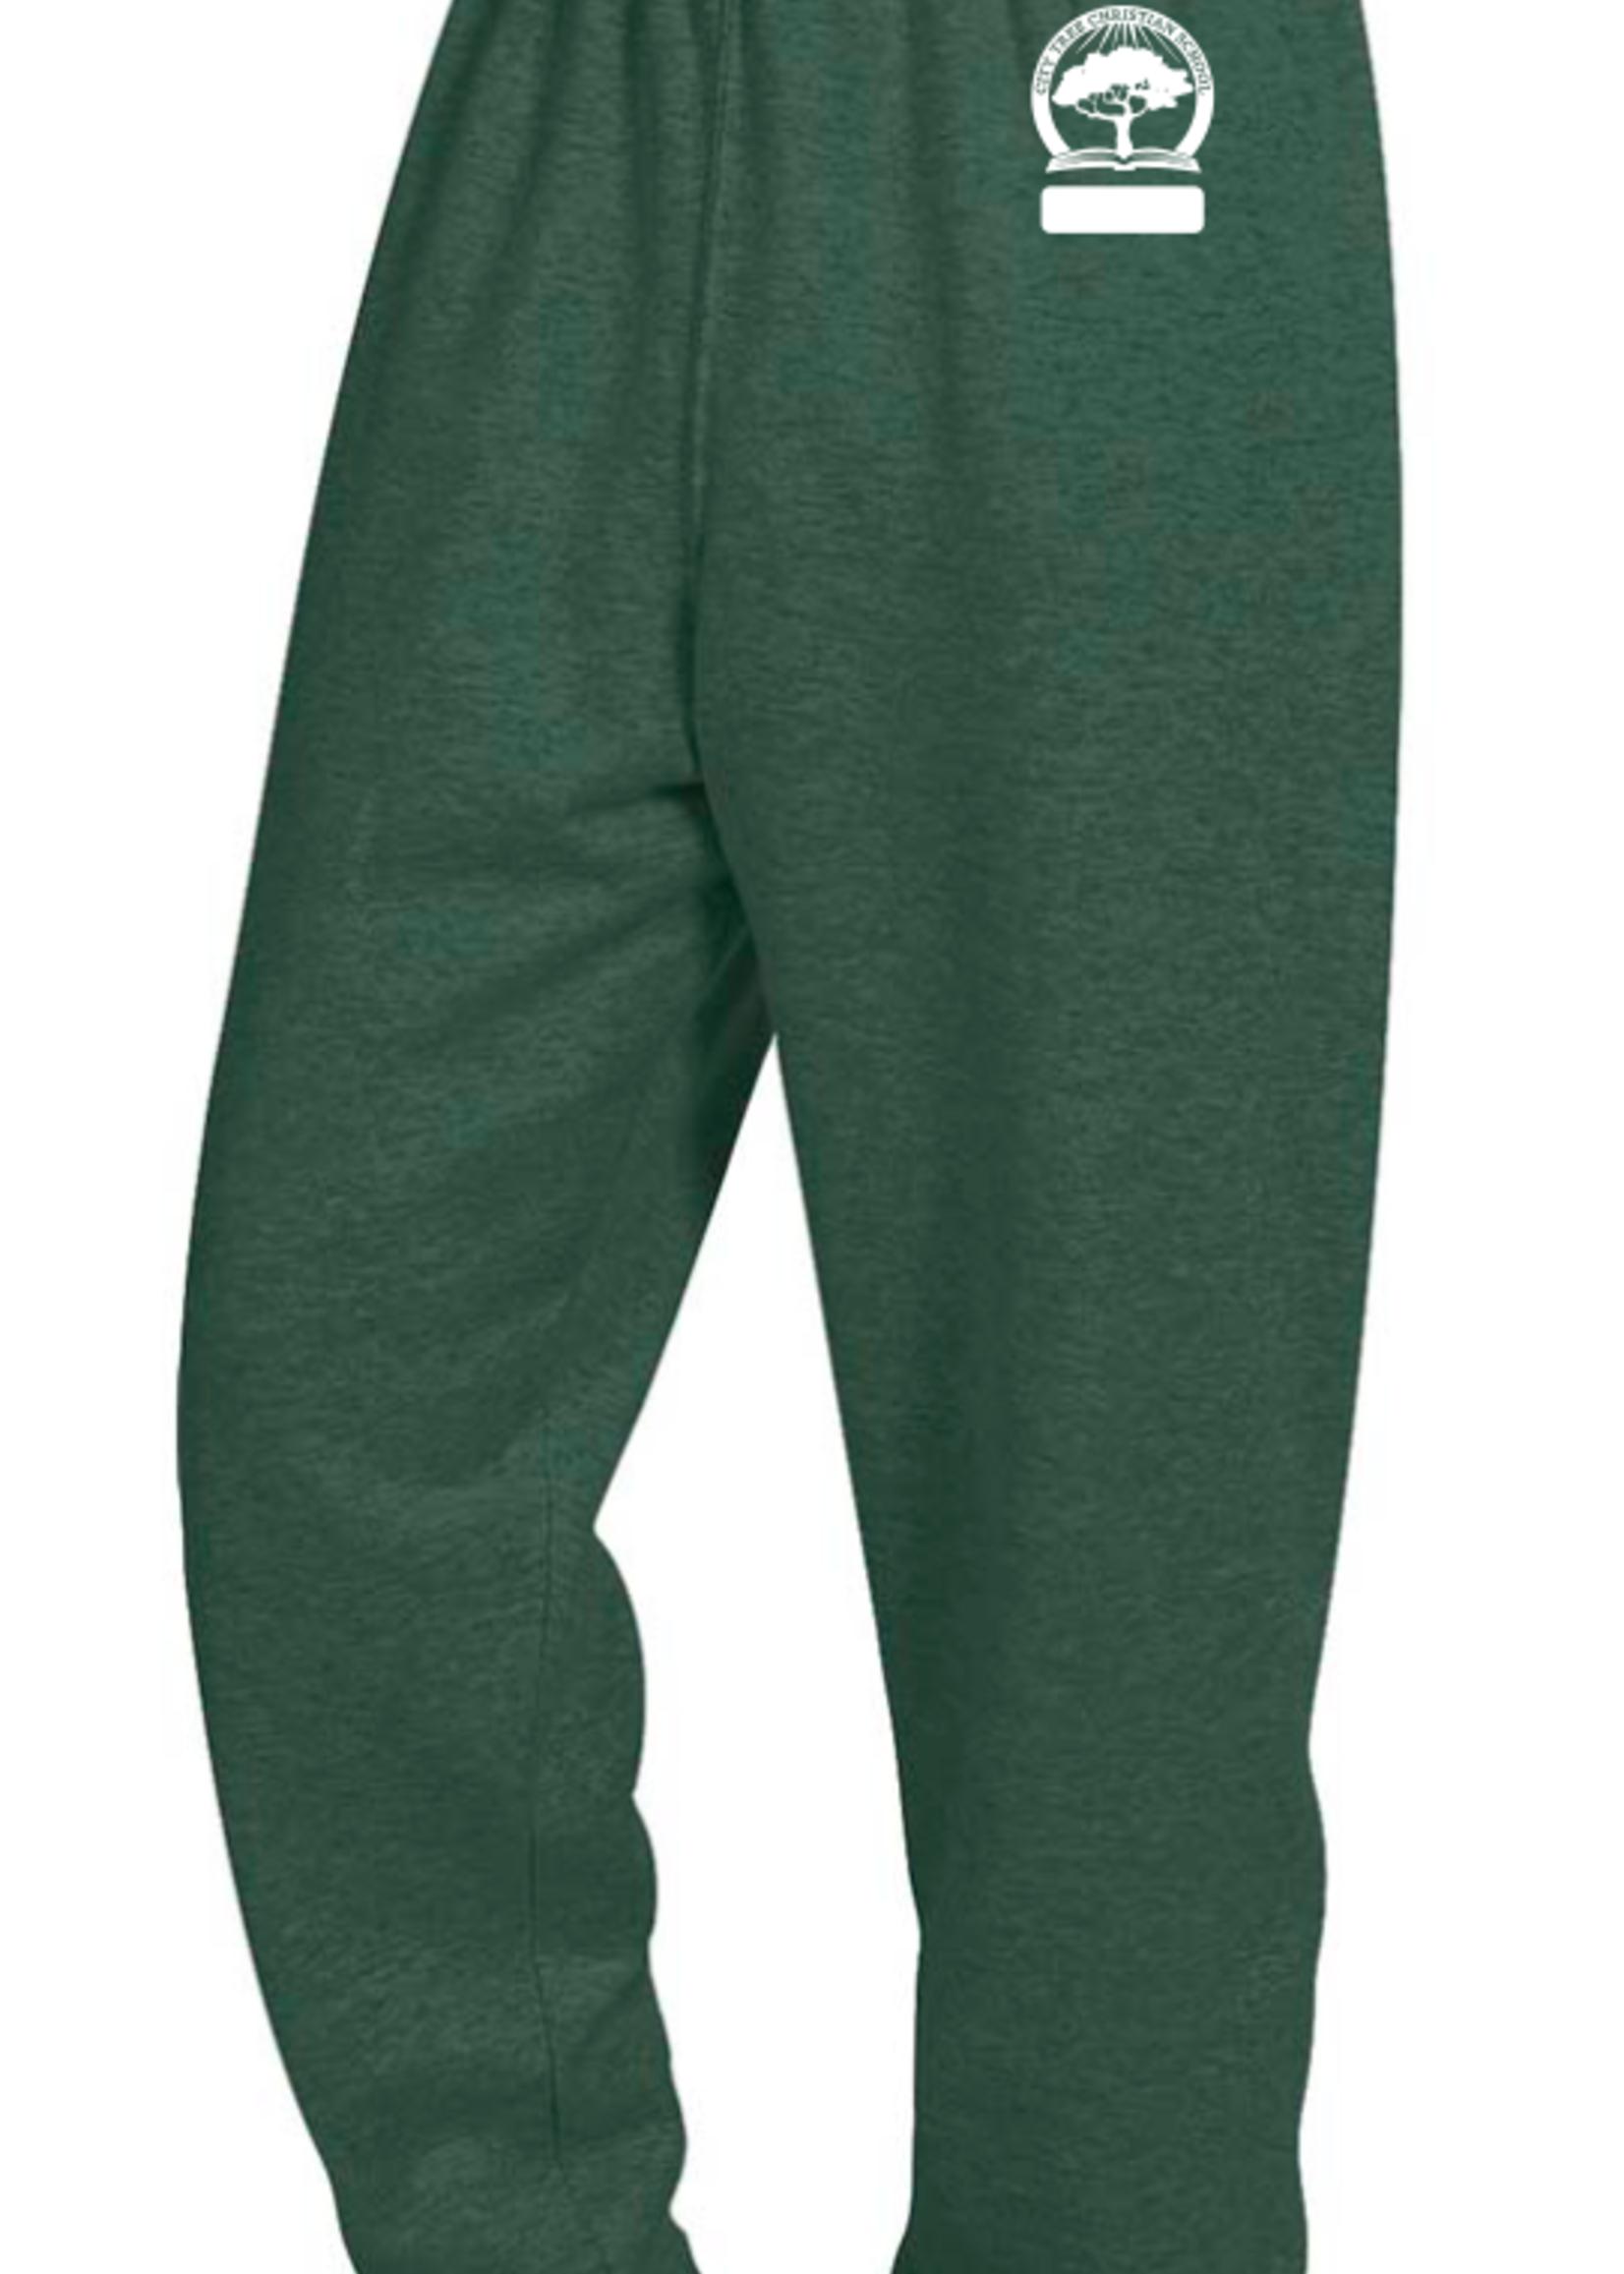 CTCS Forest Fleece Sweatpants